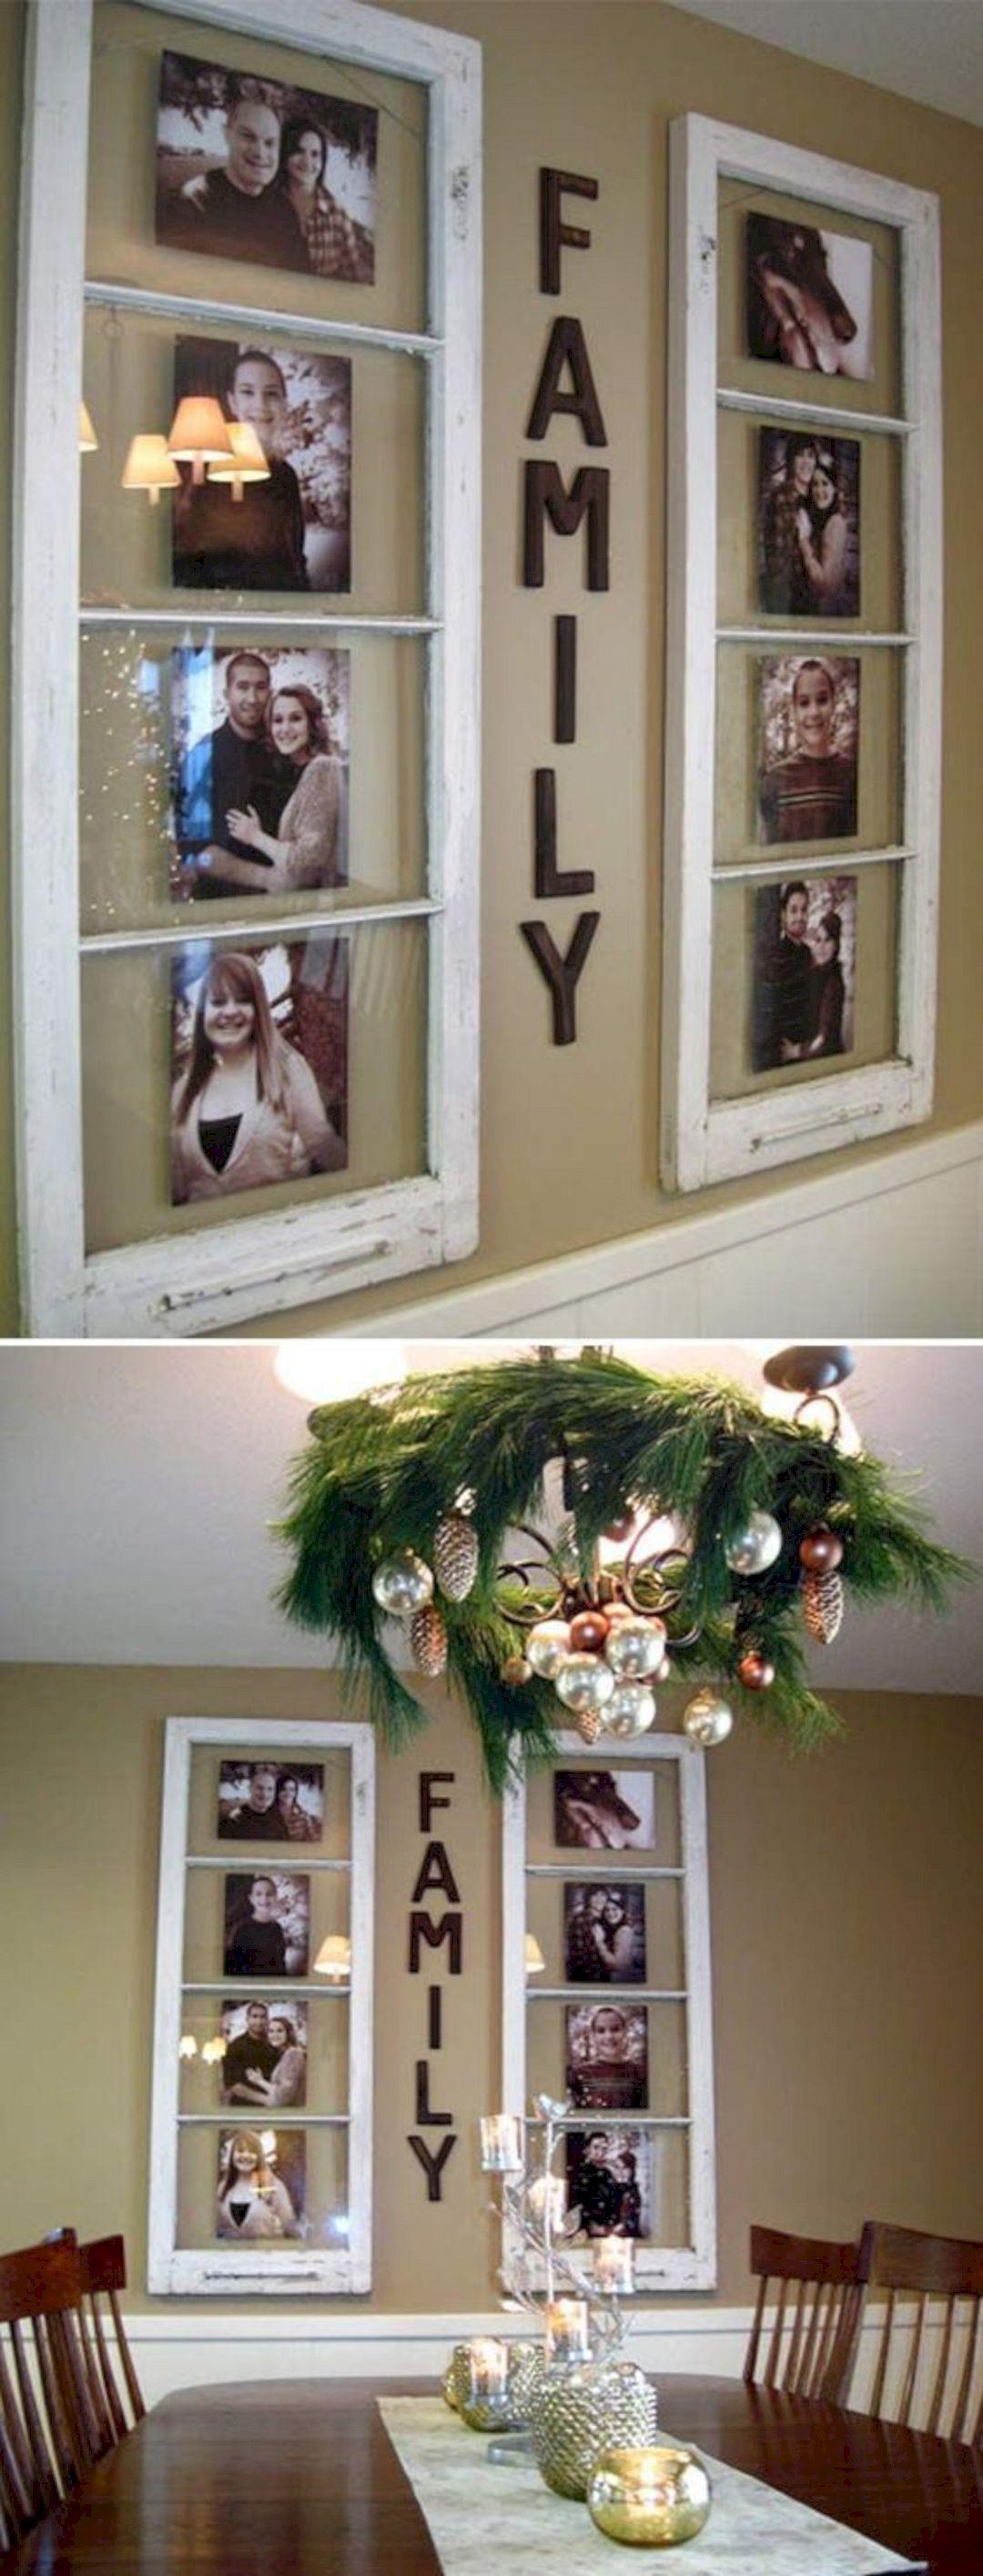 17 Cool Diy Home Decor Picture Frames Diy Crafts Deco Deco